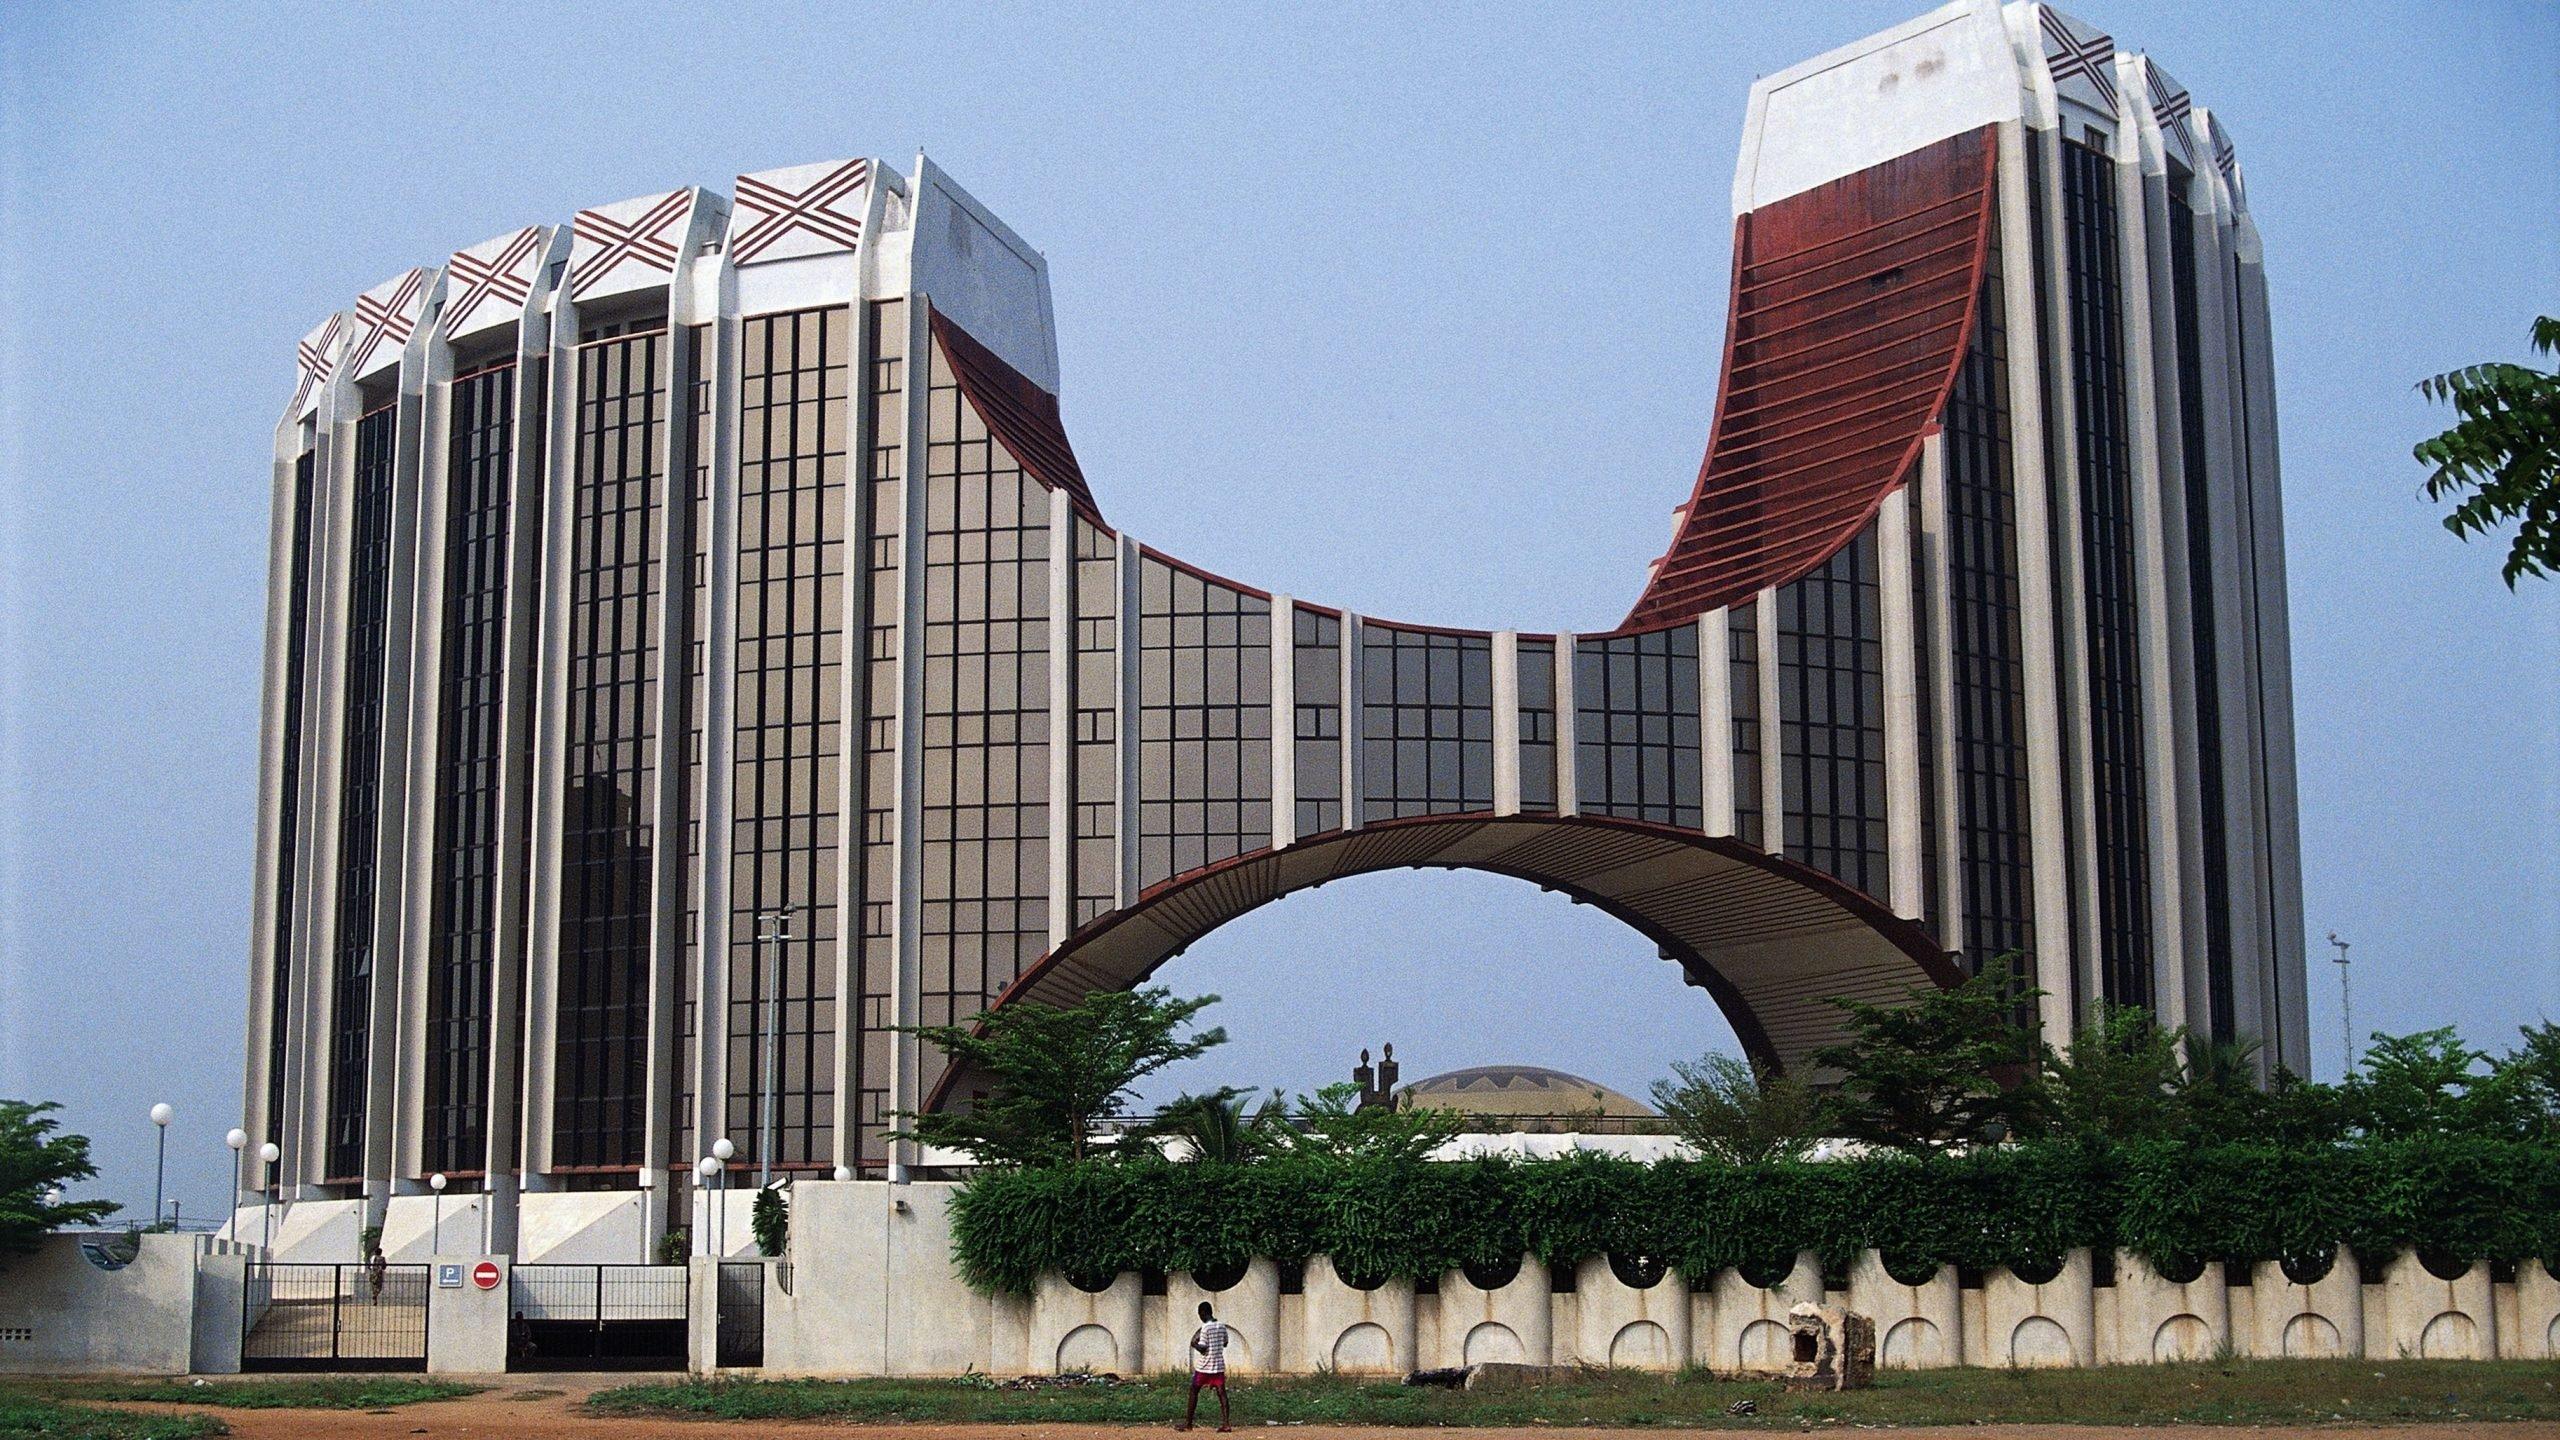 ECOWAS donates 4,000 tonnes of food items to Nigeria